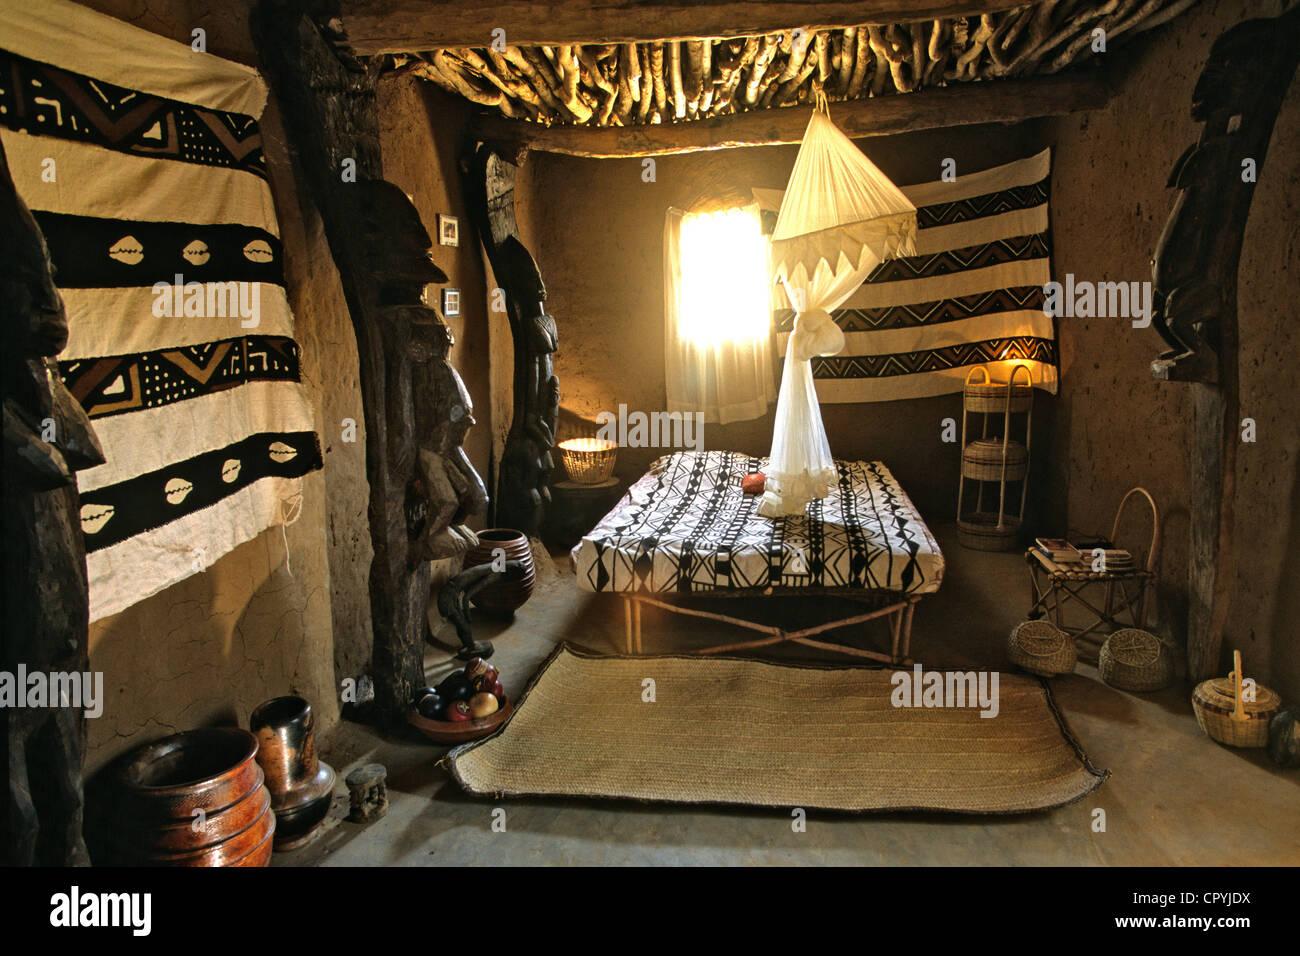 Mali, Dogon Country, Ennde, room of Alakala camp - Stock Image